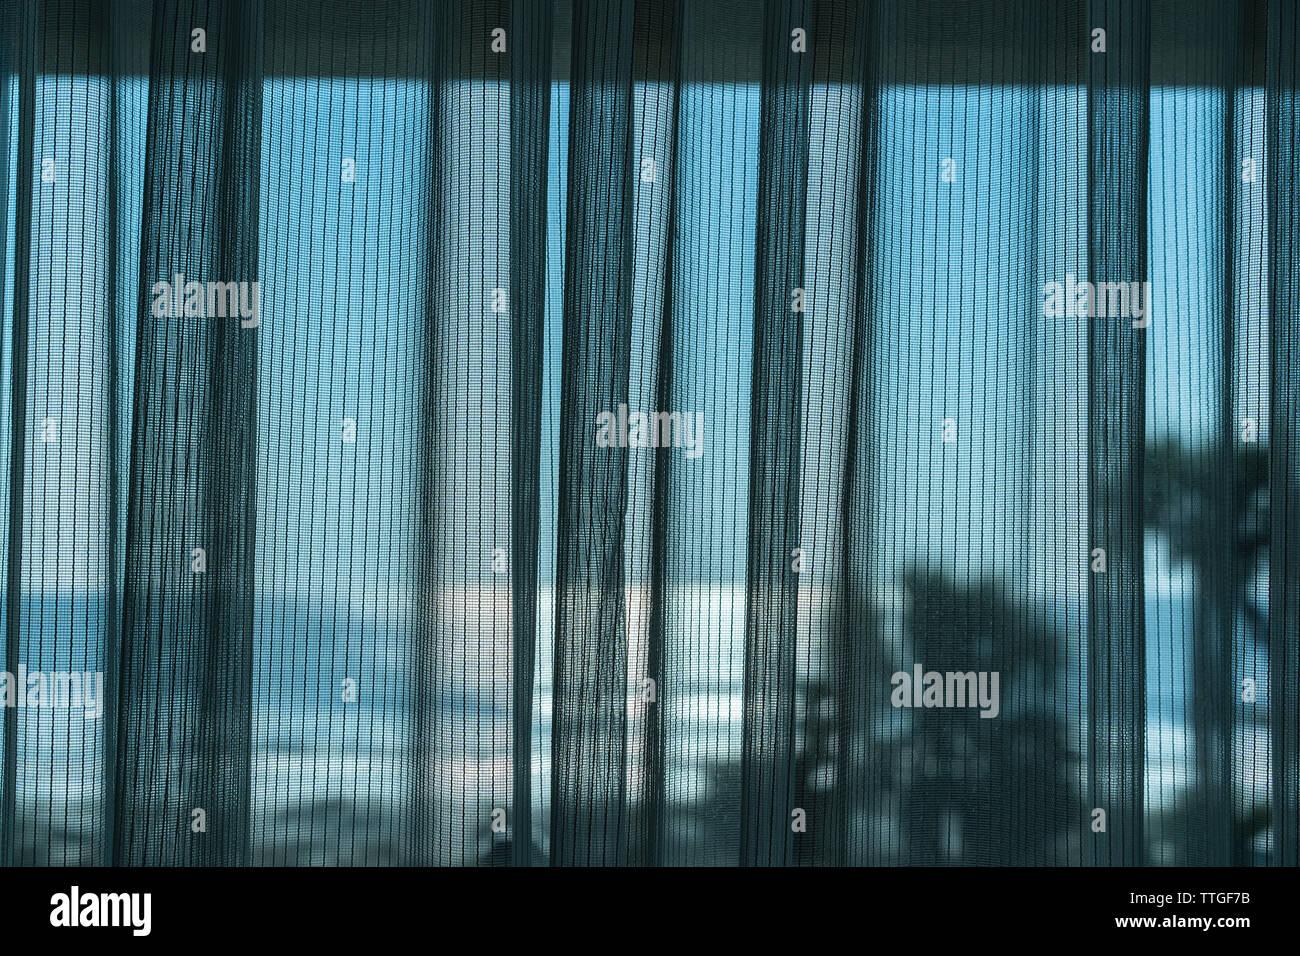 Mesh curtain drawn across window of hotel room overlooking the ocean - Stock Image